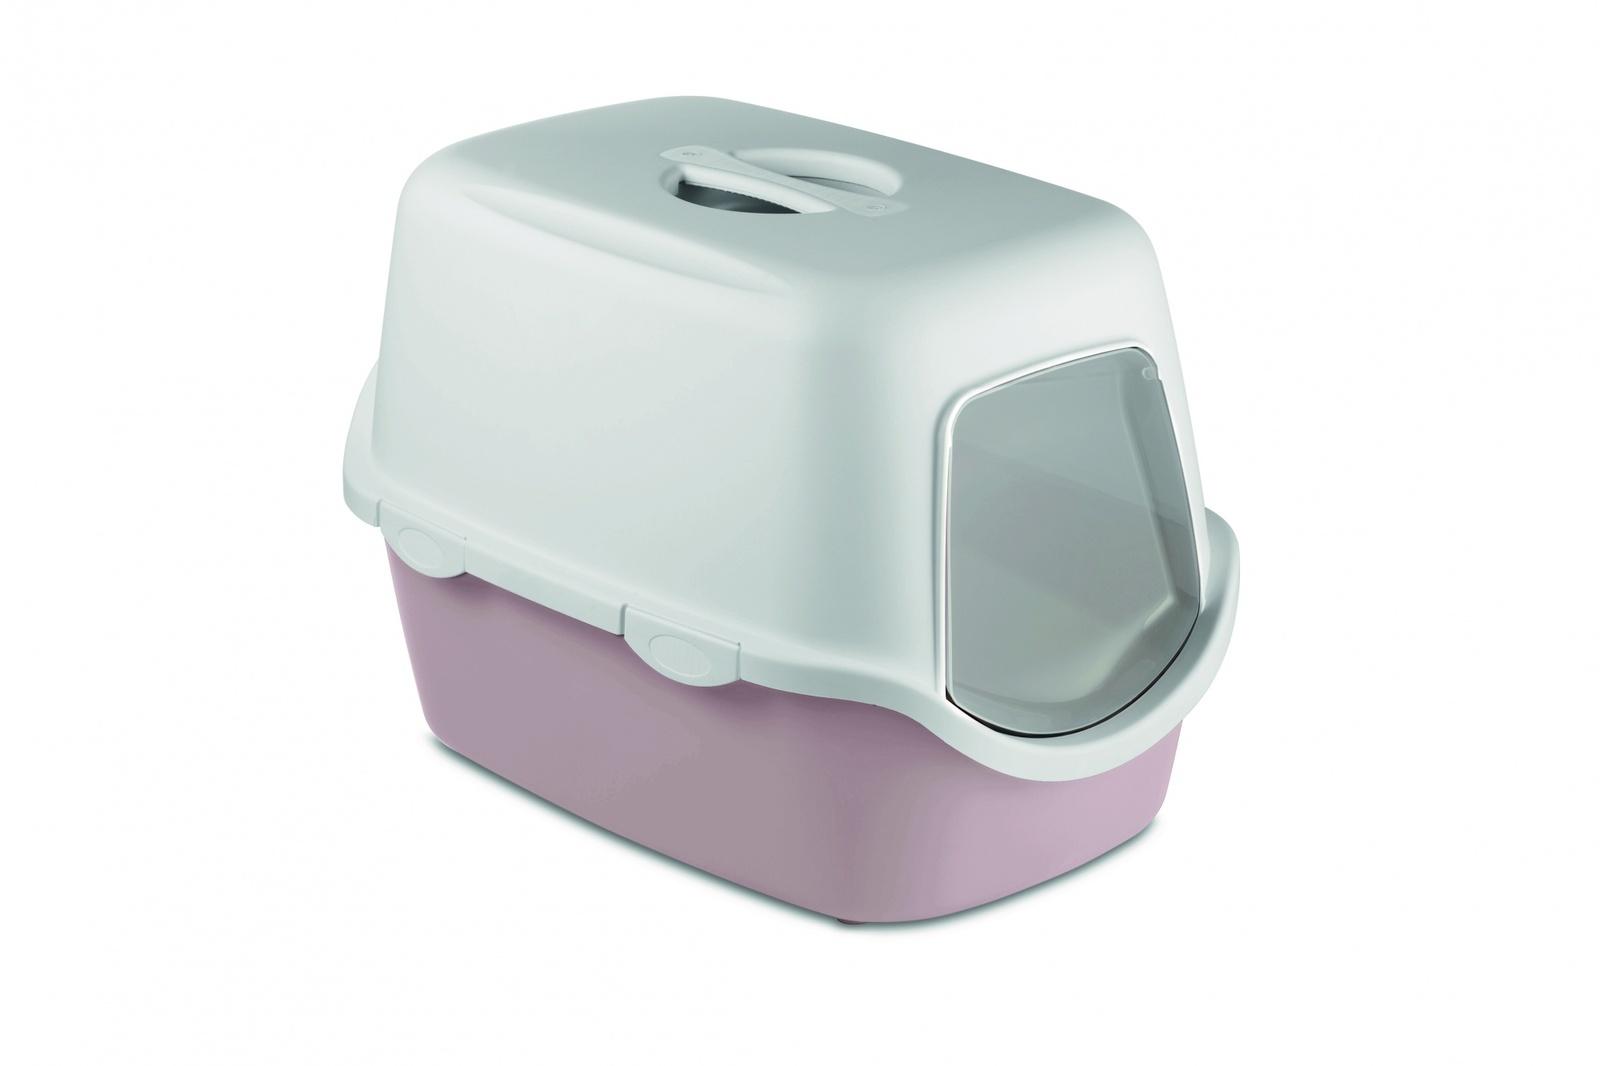 Stefanplast Туалет закрытый Cathy, с угольным фильтром, пудровый, 56х40х40 см (1,53 кг)